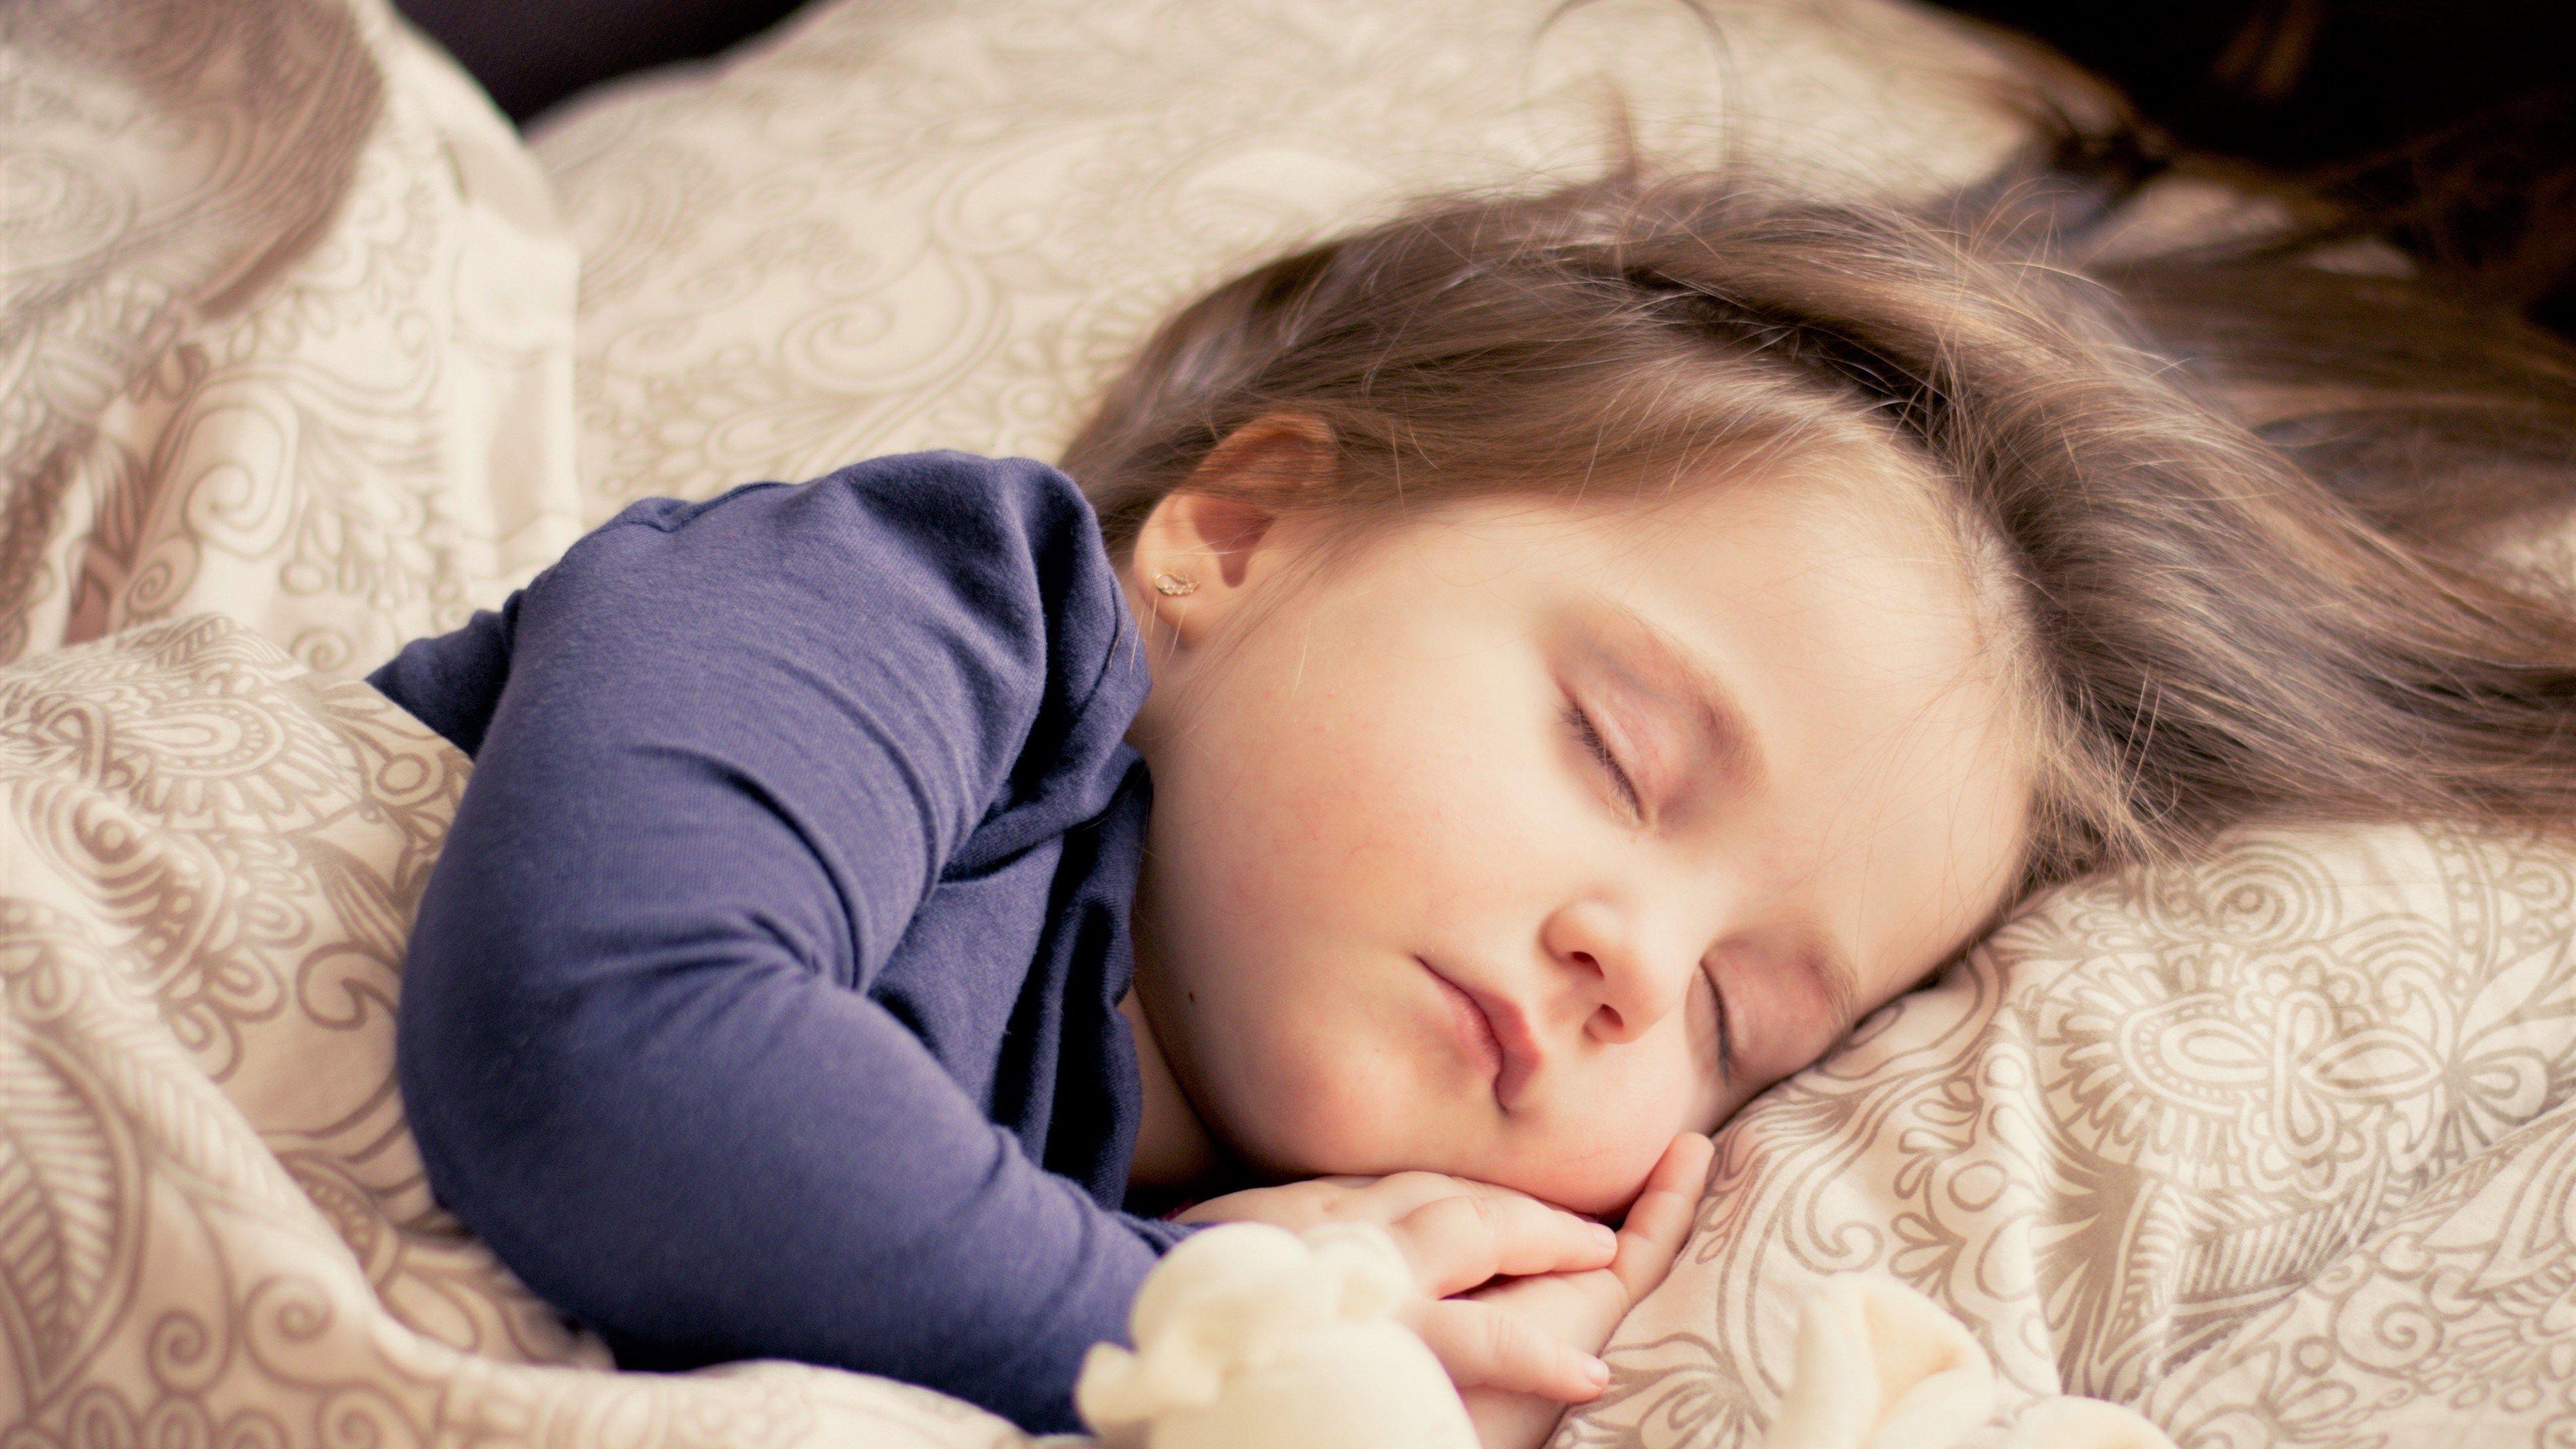 Cute Child Sleeping Wallpapers Hd Kids Sleep Baby Wallpaper National Nap Day